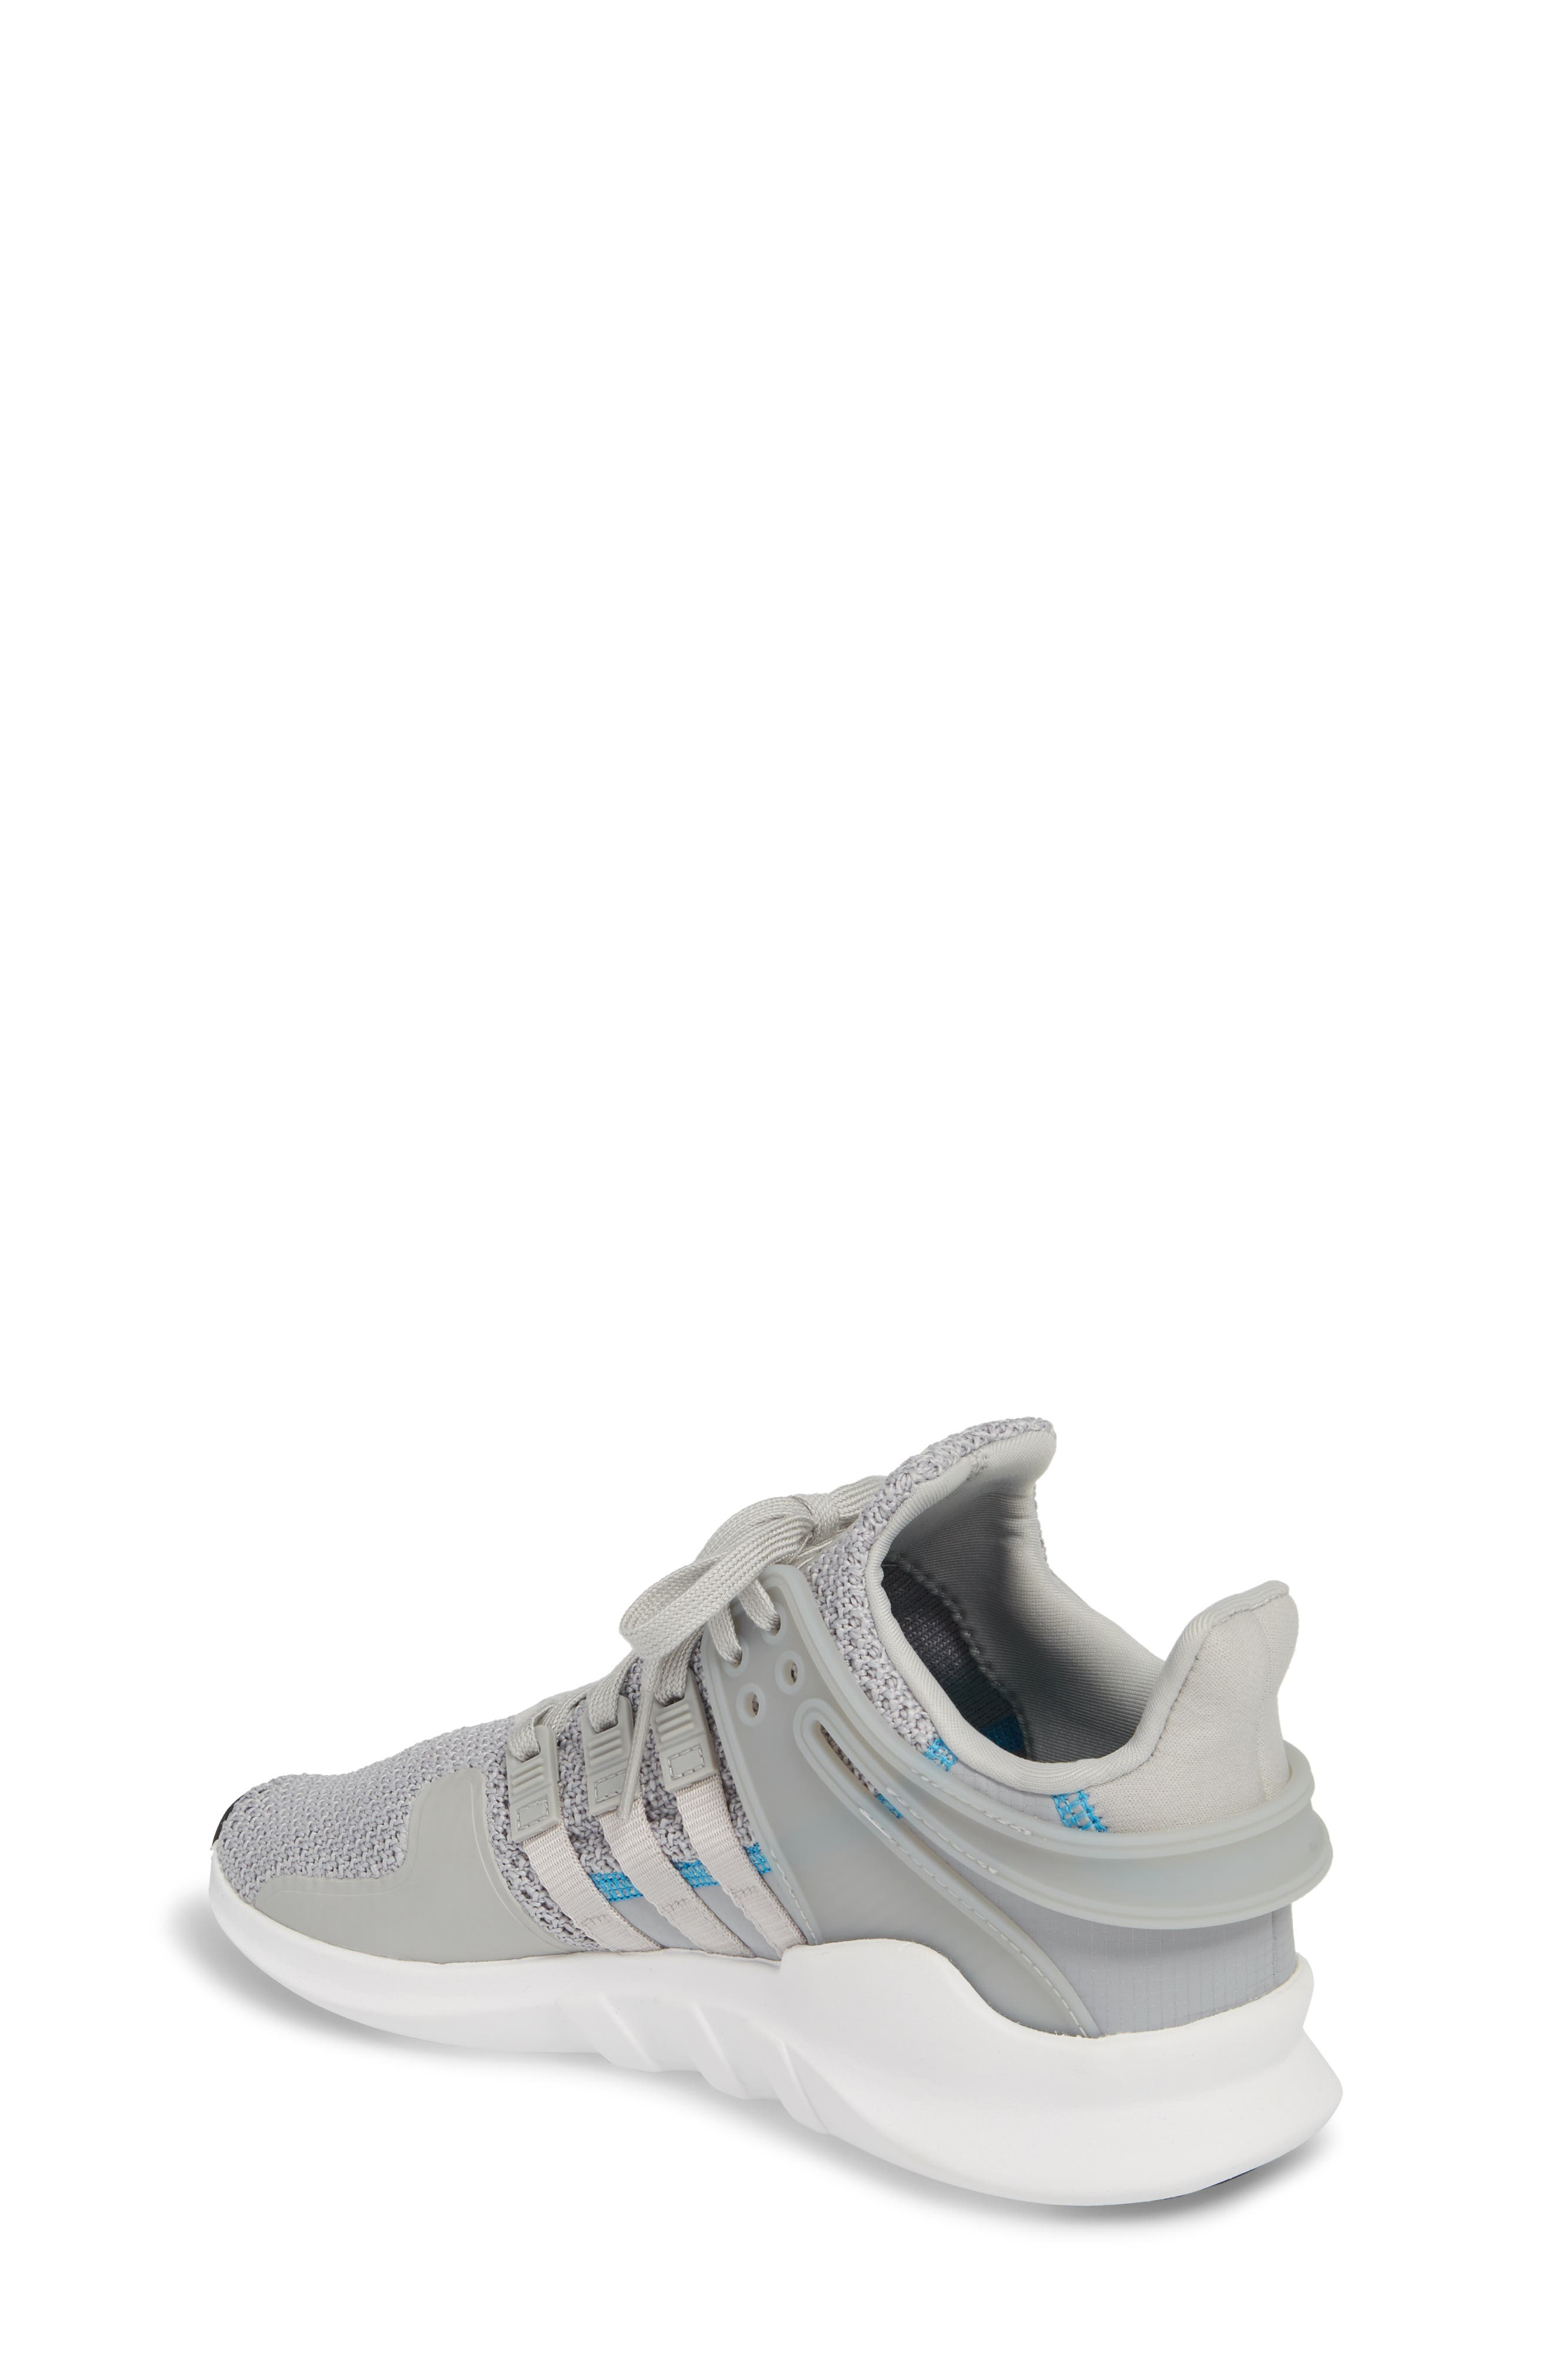 EQT Support Adv Sneaker,                             Alternate thumbnail 2, color,                             023